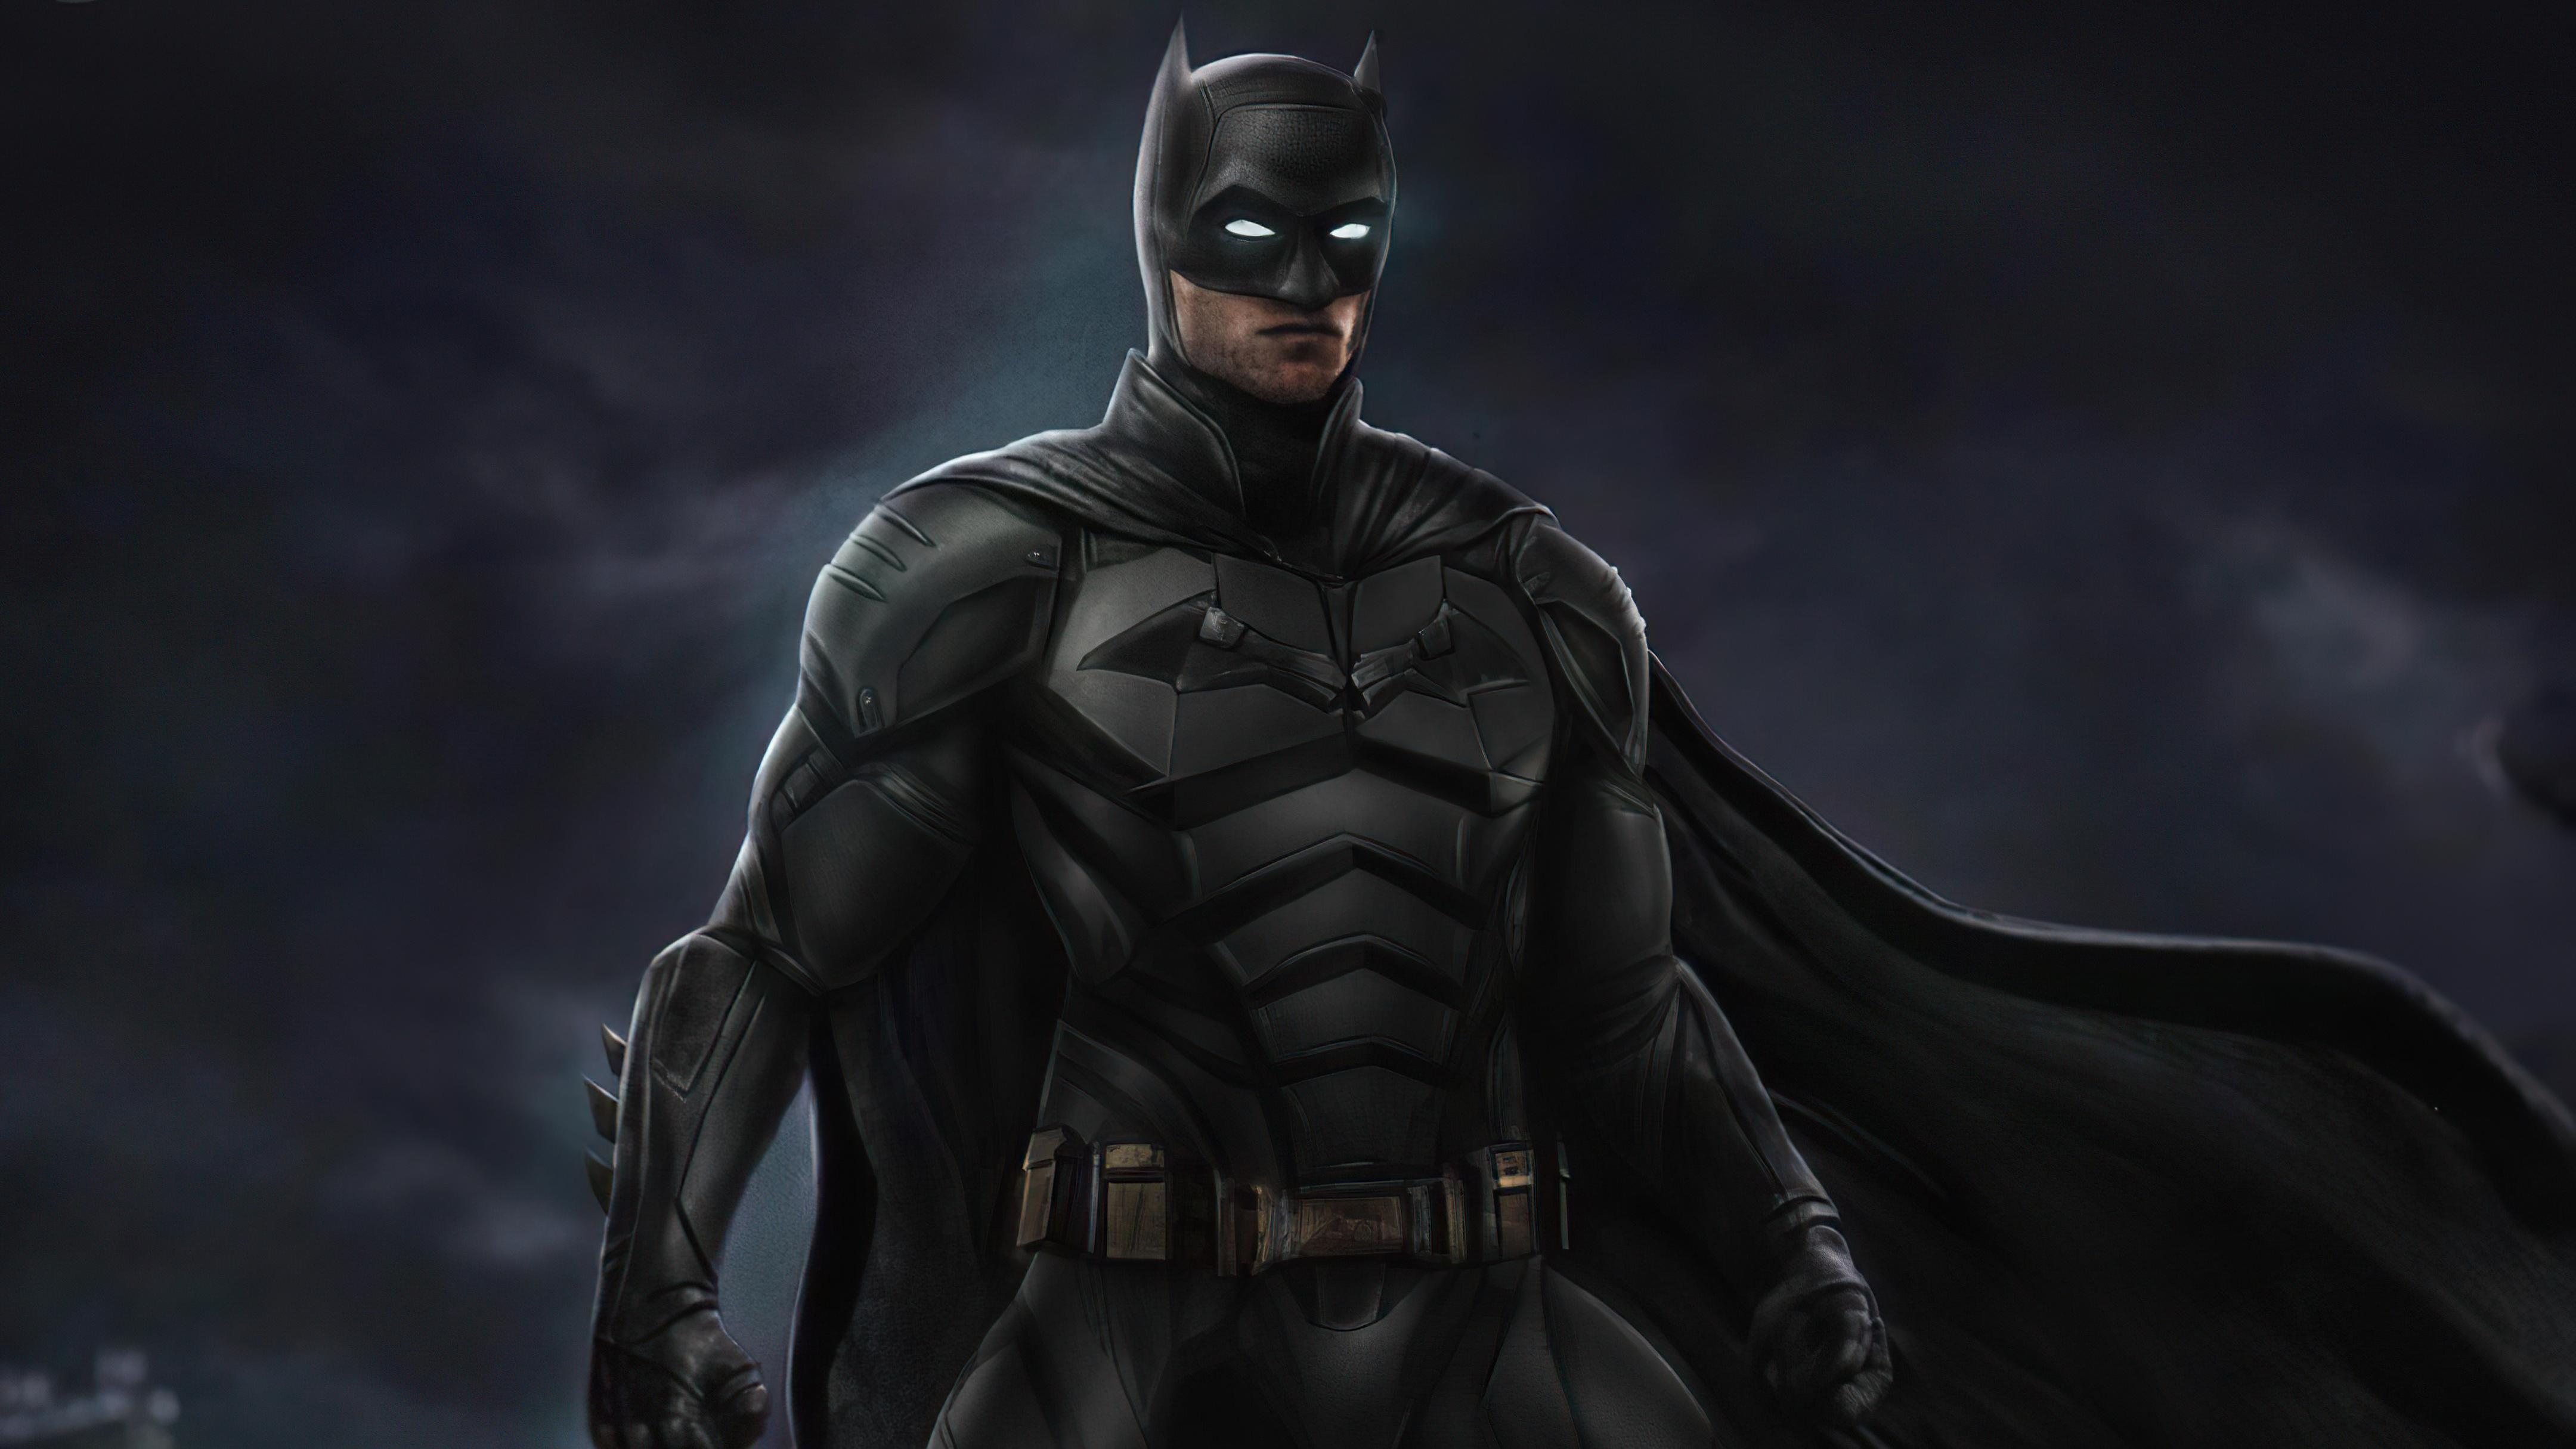 batman the dark soul 4k 1616956633 - Batman The Dark Soul 4k - Batman The Dark Soul 4k wallpapers